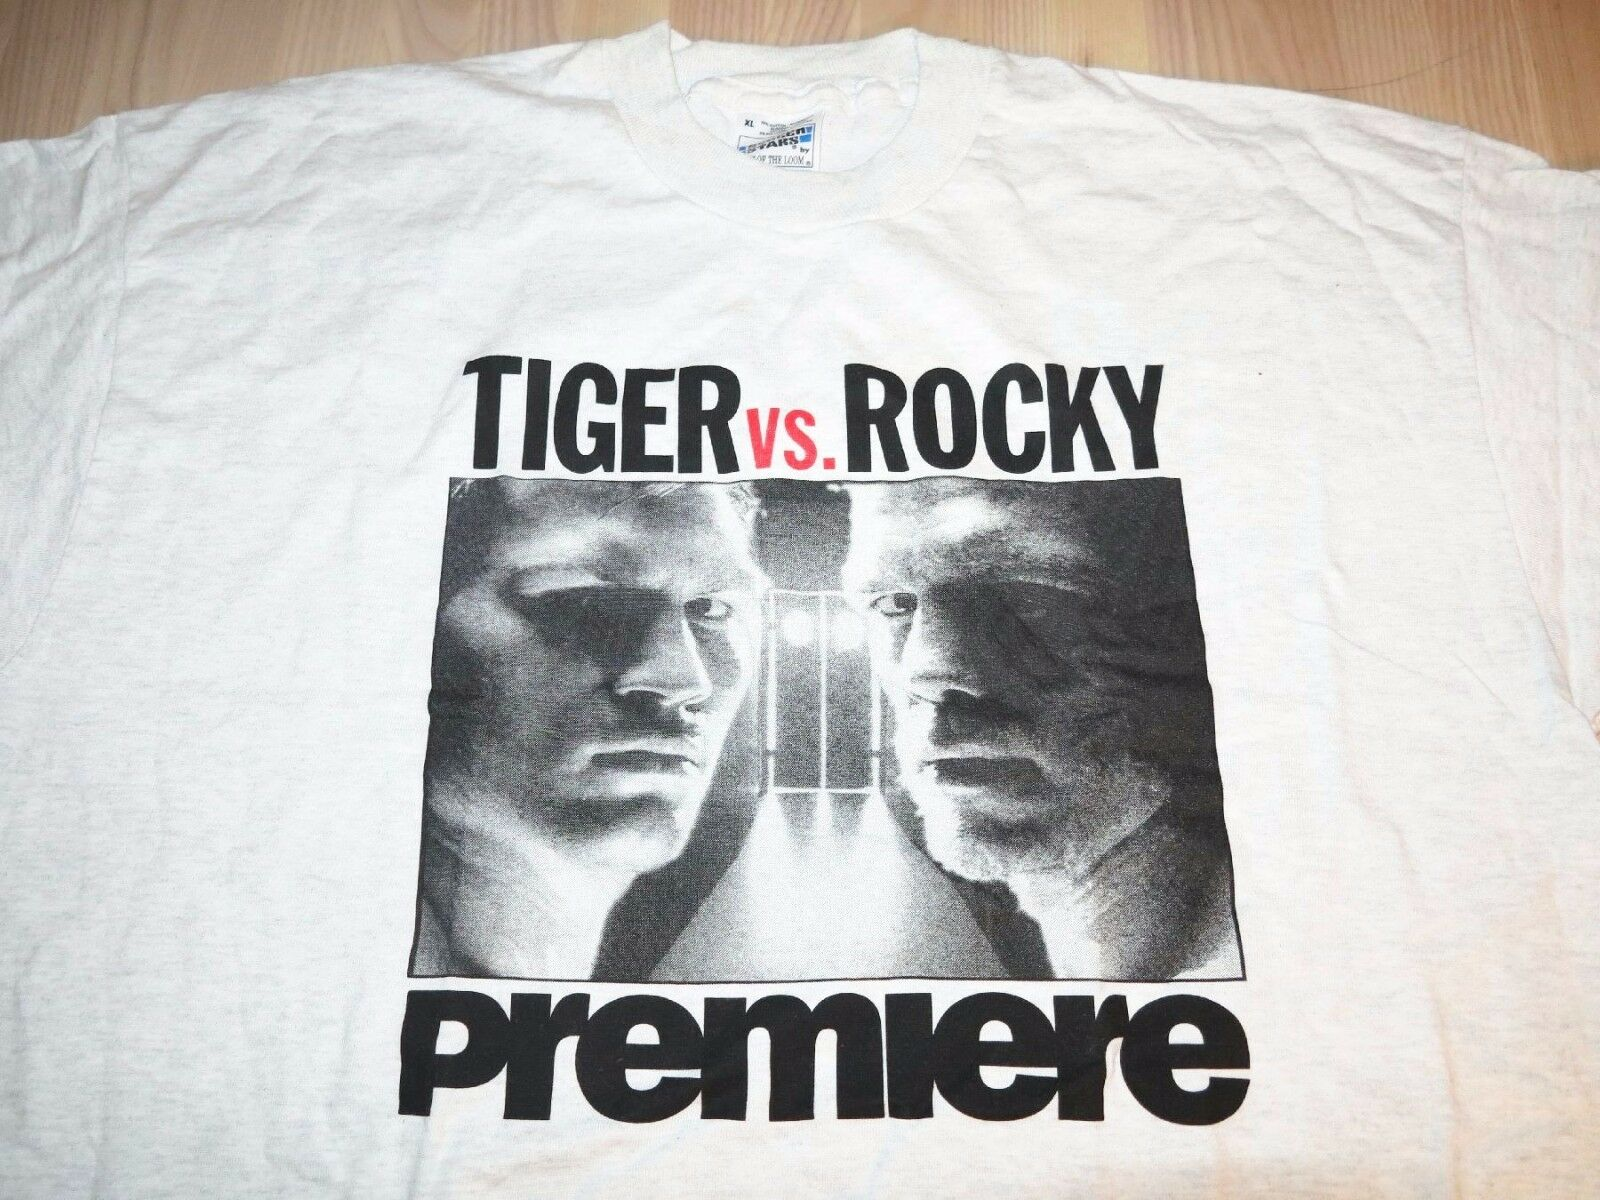 Graciano Rocchigiani vs. Dariusz michalczewski fight maglietta 1996 MINT T-SHIRT NUOVO MINT 1996 35817e